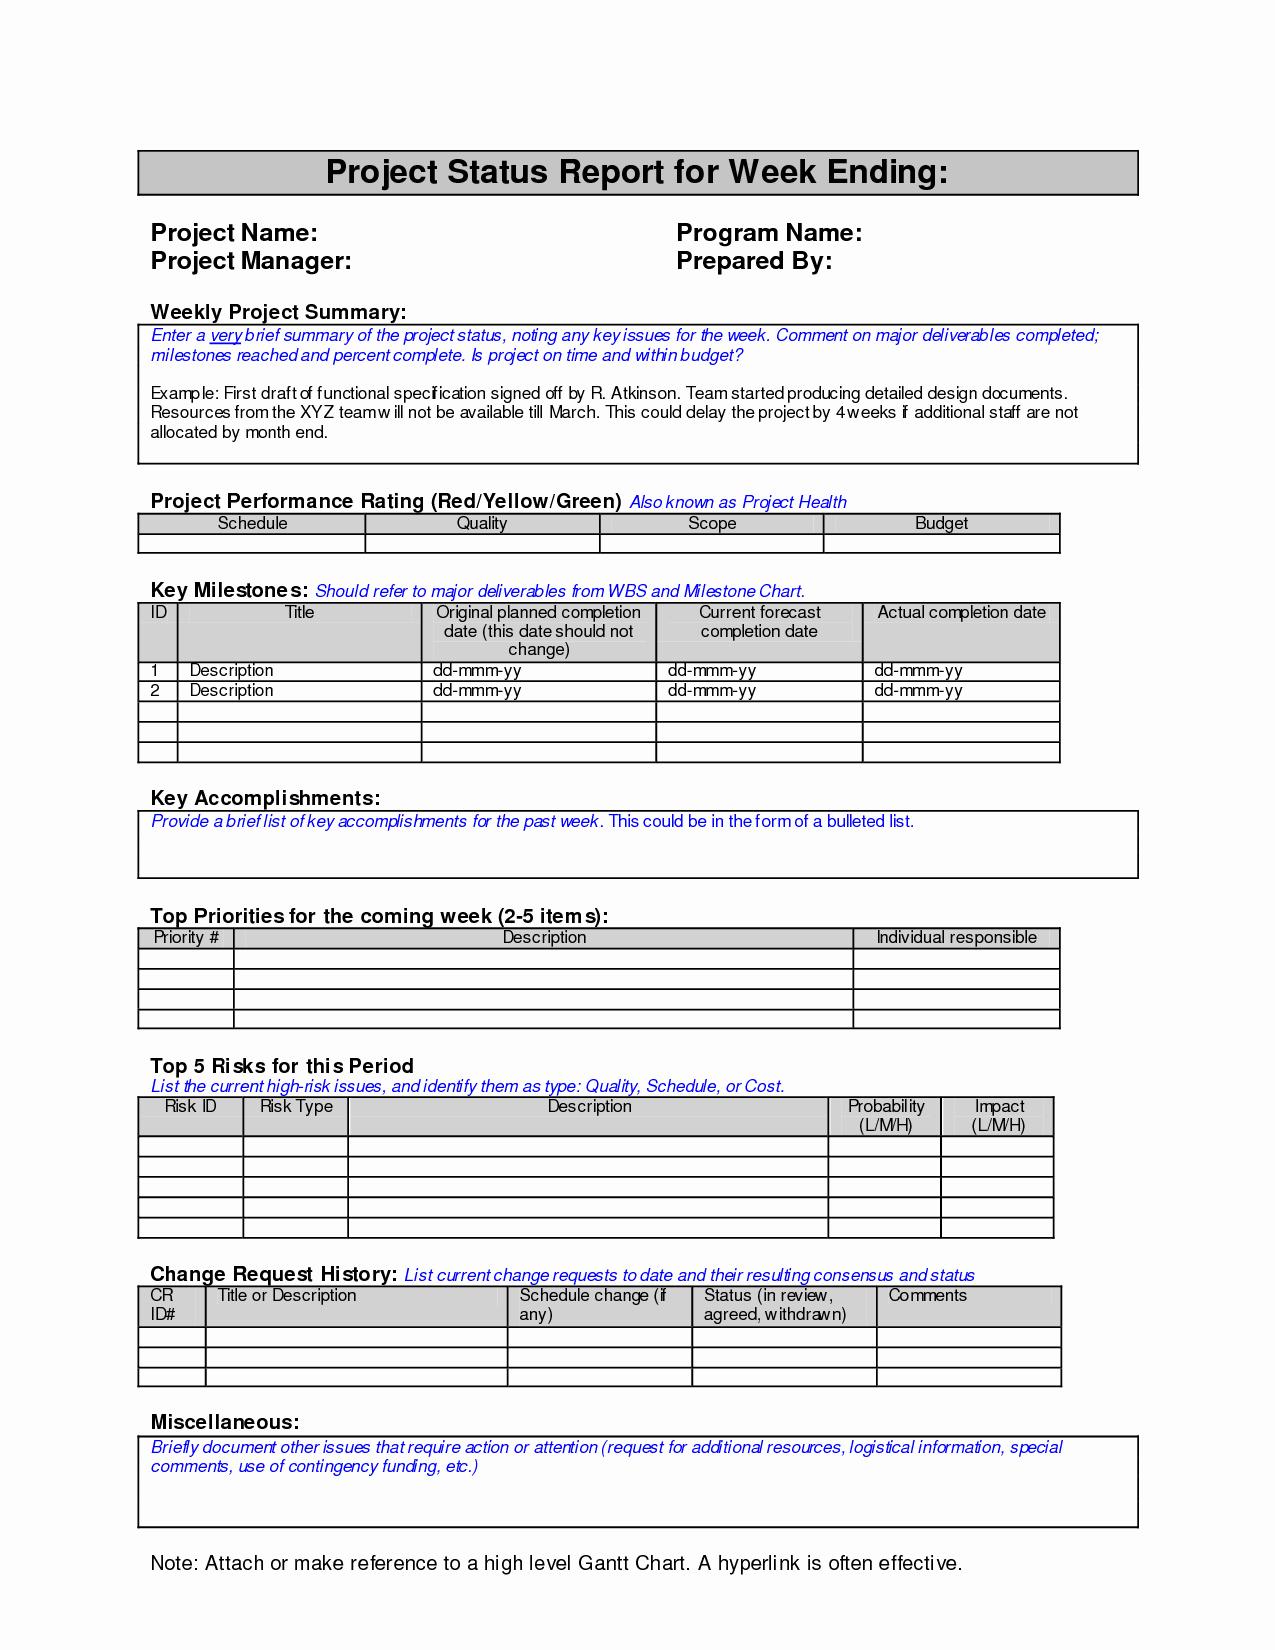 Weekly Status Report Template Elegant Weekly Project Status Report Sample Google Search